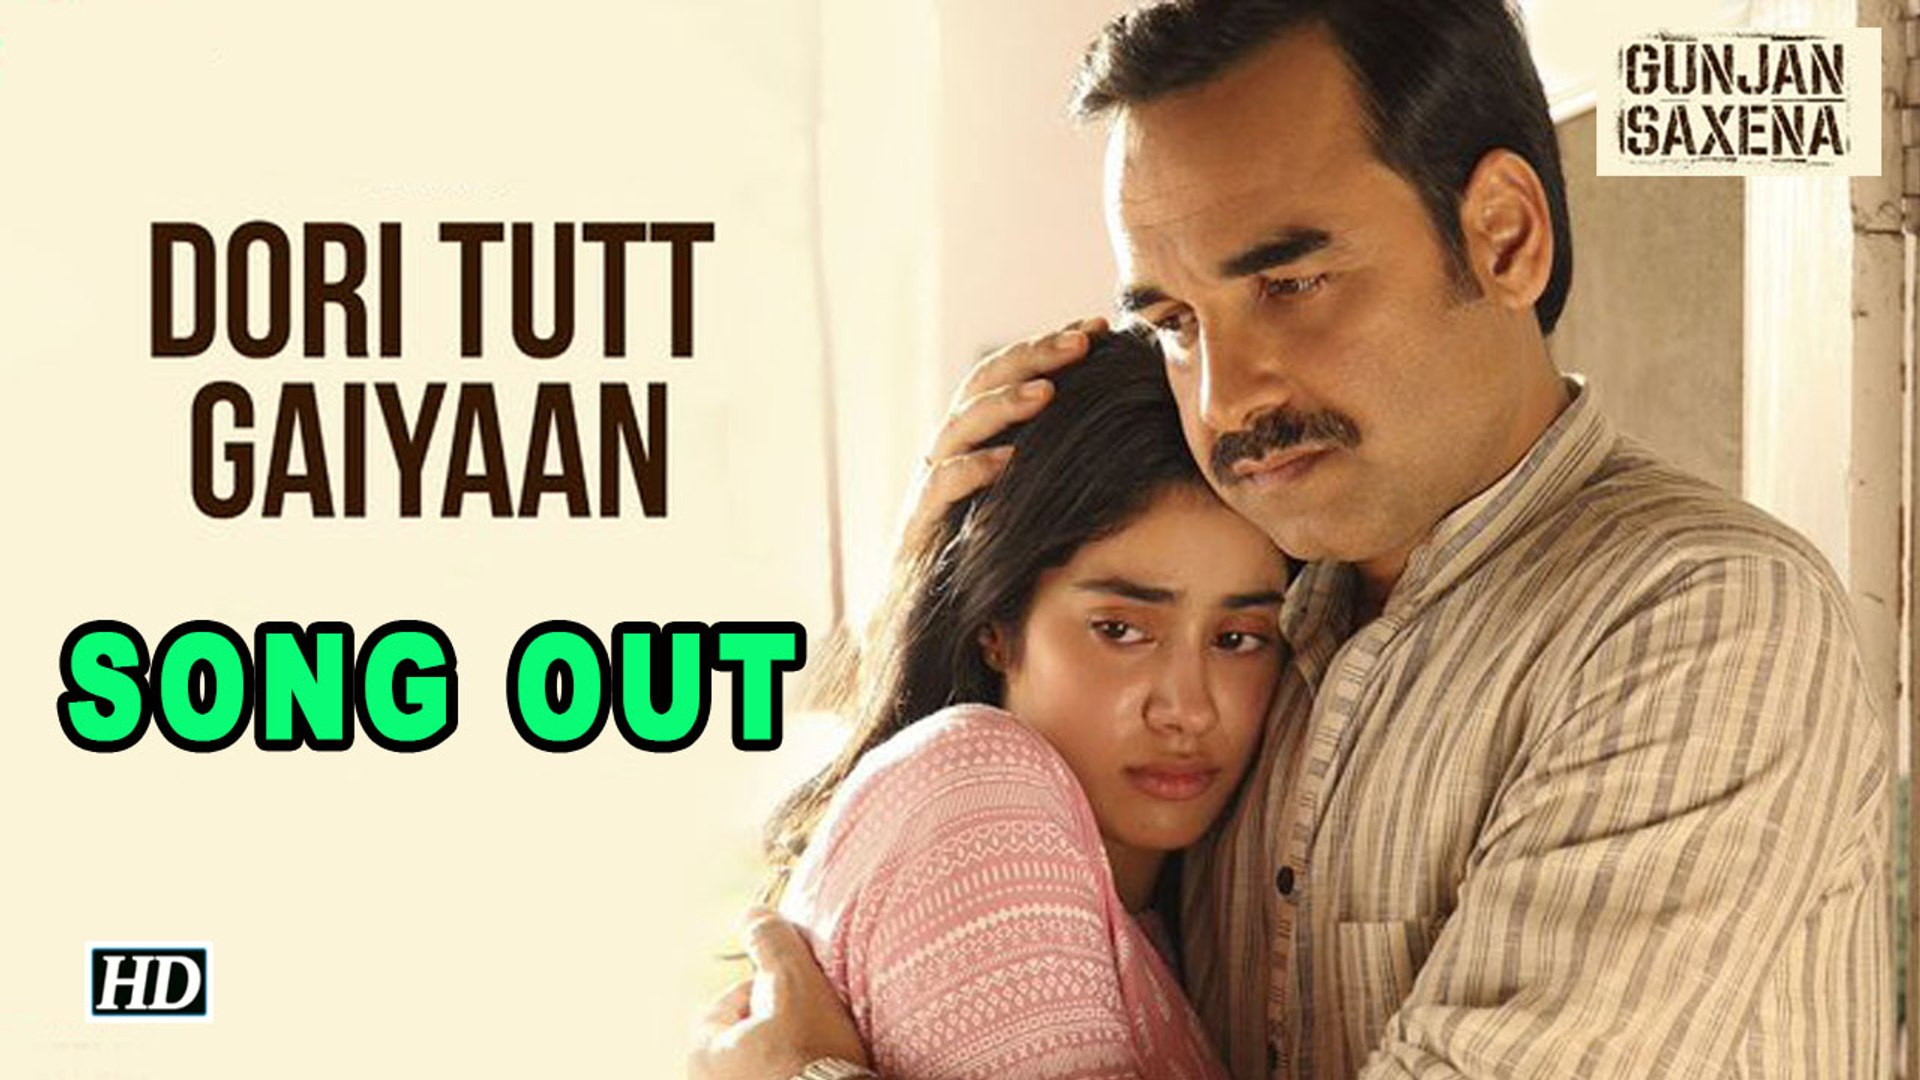 Gunjan Saxena The Kargil Girl Dori Tutt Gaiyaan New Song Out Now Video Dailymotion